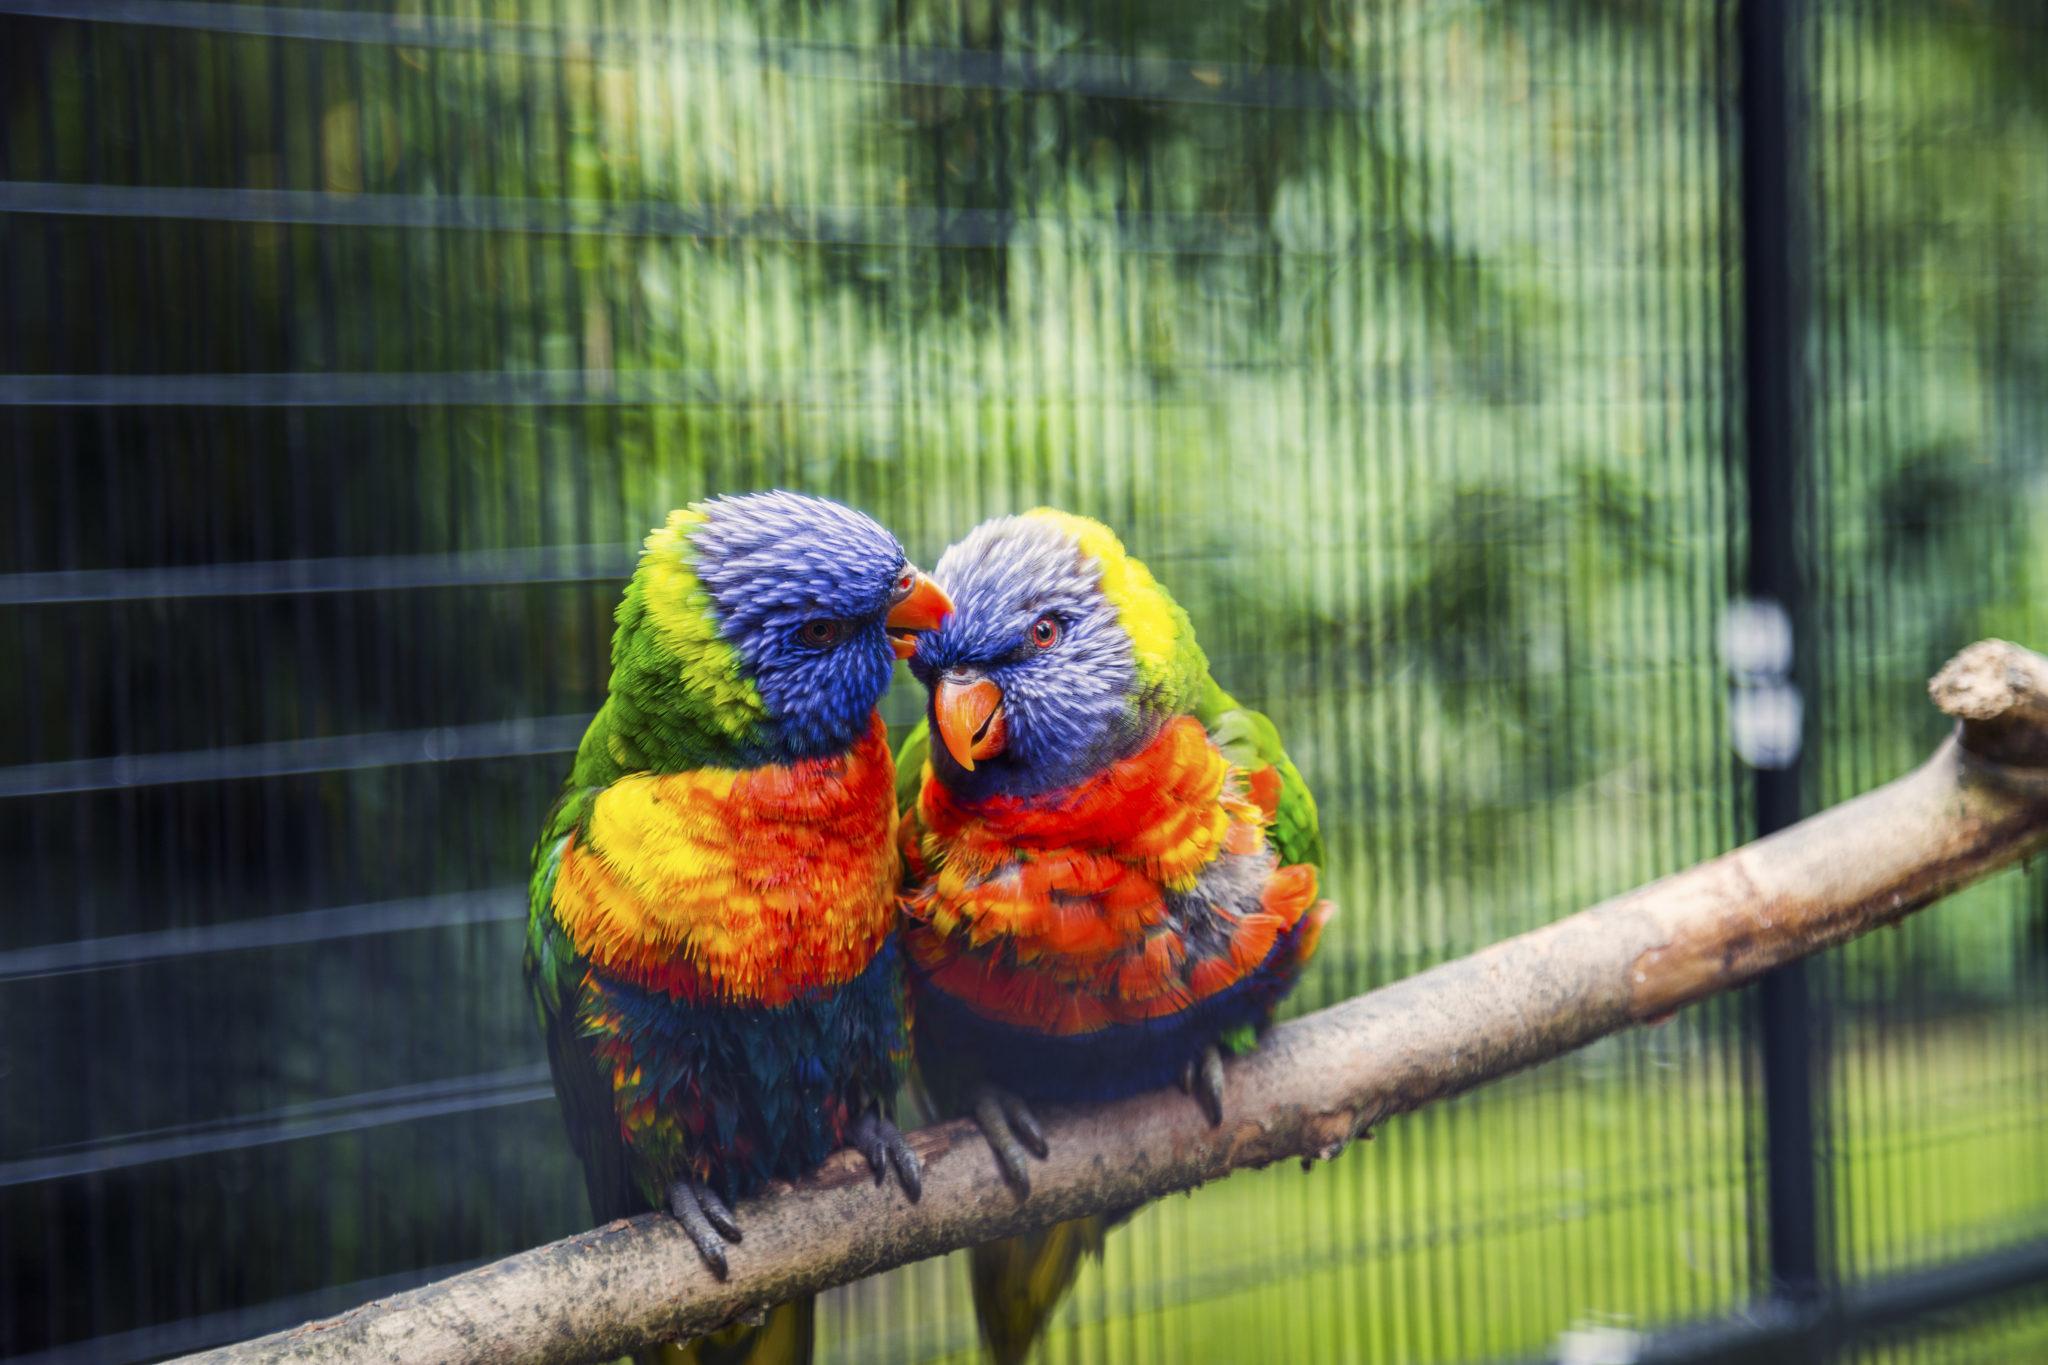 Photo by Anupam Hatui/Picfair, Love Birds, New Zealand rainbow lorikeet.